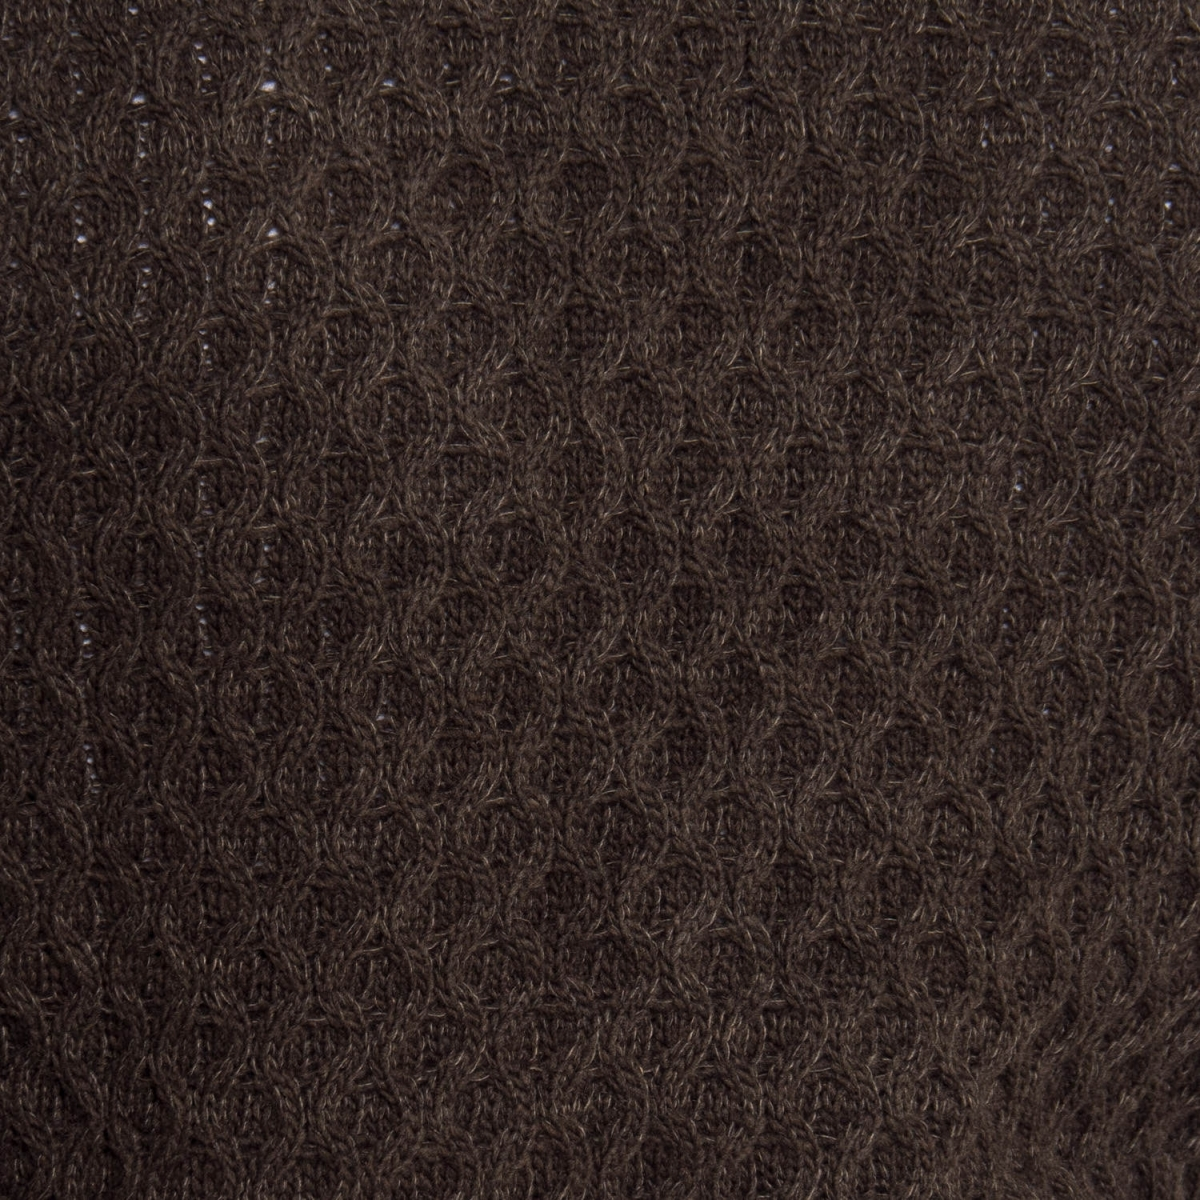 abbigliamento Maglieria uomo Cardigan GLBW799 GIANNI LUPO Cafedelmar Shop